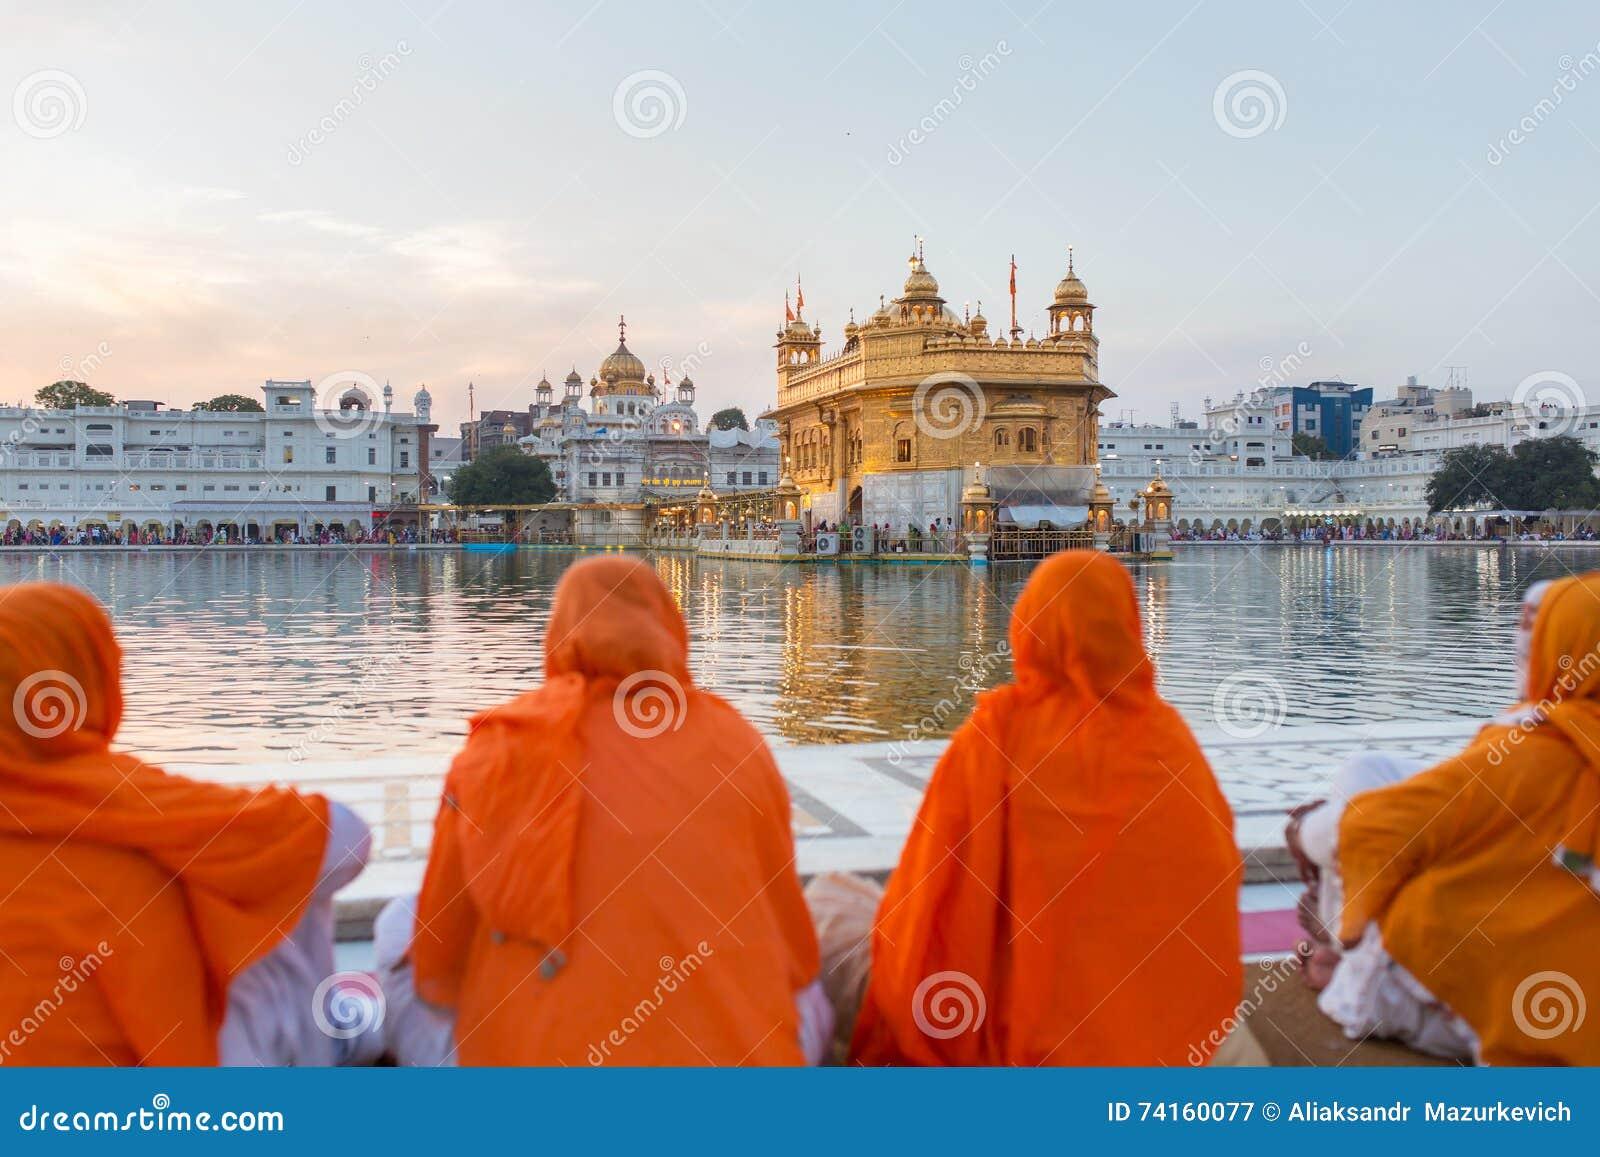 Goldener Tempel in Amritsar, Punjab, Indien